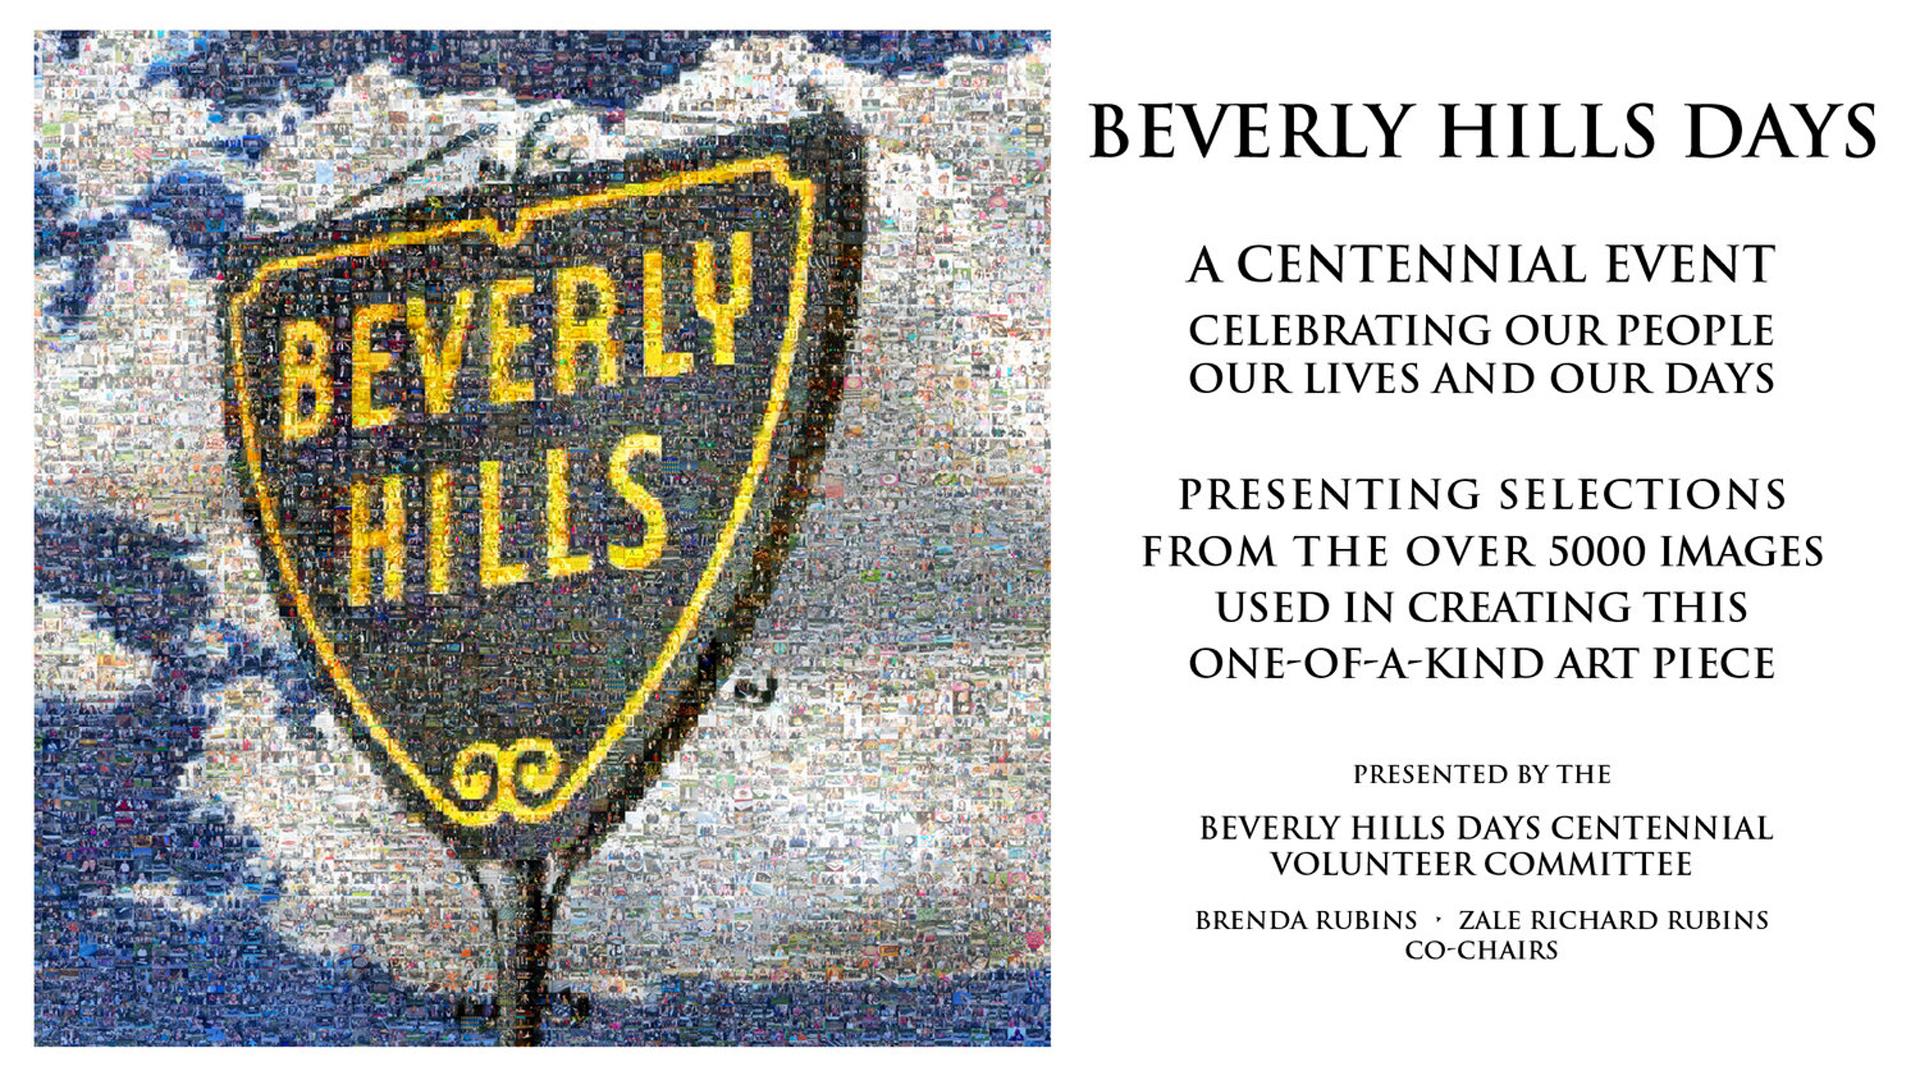 BHD01_Beverly Hills Days_02.jpg